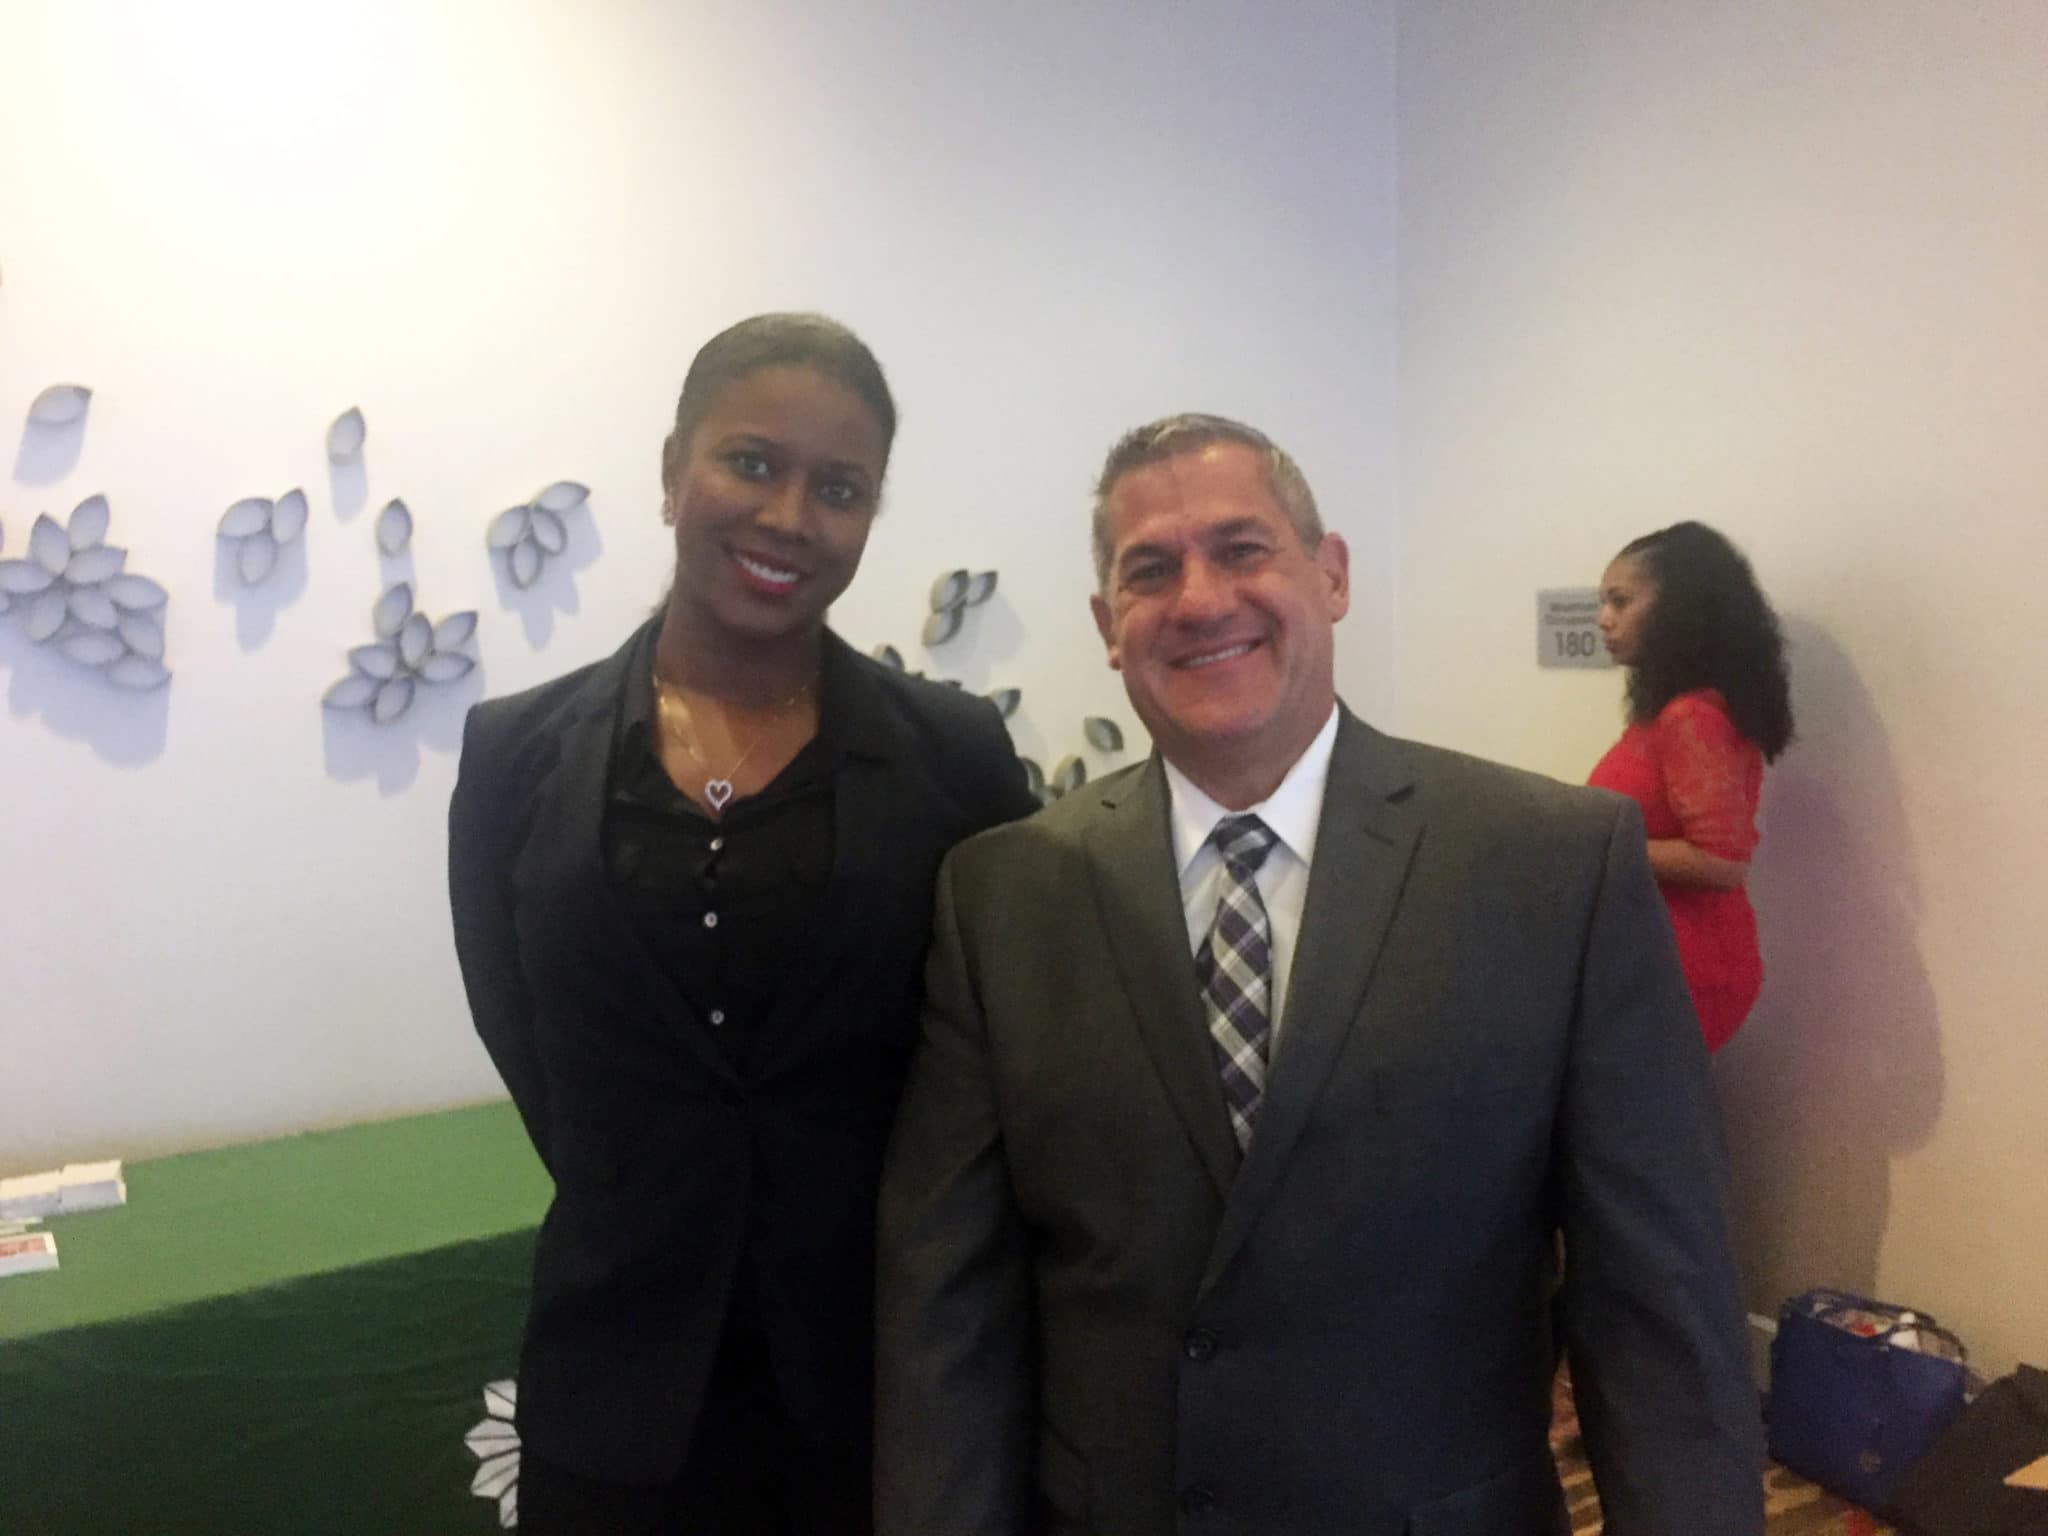 Tanisha Thorpe, the Children's Director Maryland with Brian Dion, Regional Vice President, Arizona, Maryland, New Mexico, Pennsylvania, and Utah.